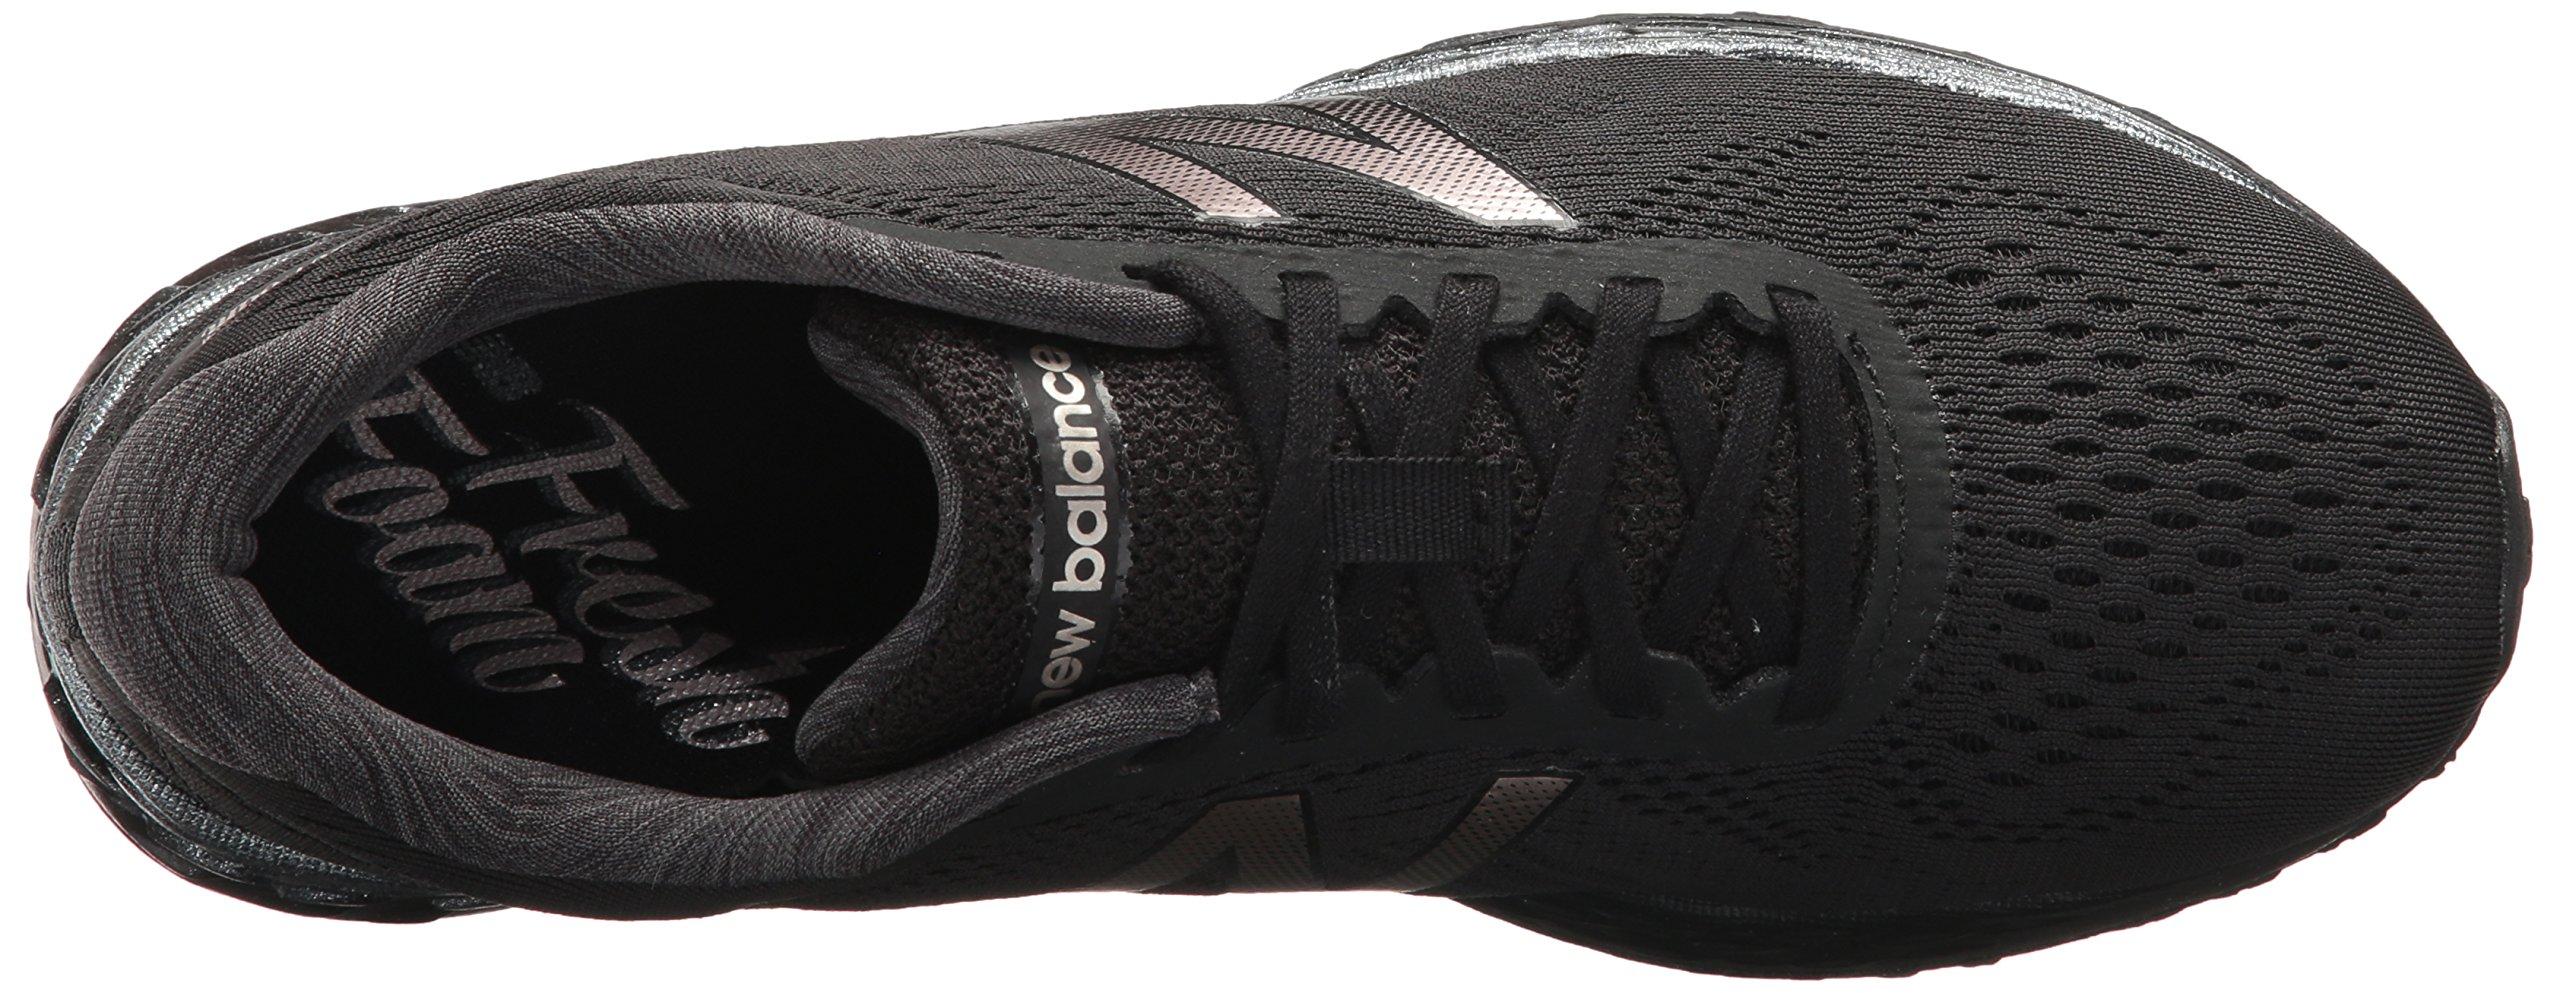 New Balance Women's Arishi v1 Fresh Foam Running Shoe, Black, 5 B US by New Balance (Image #8)